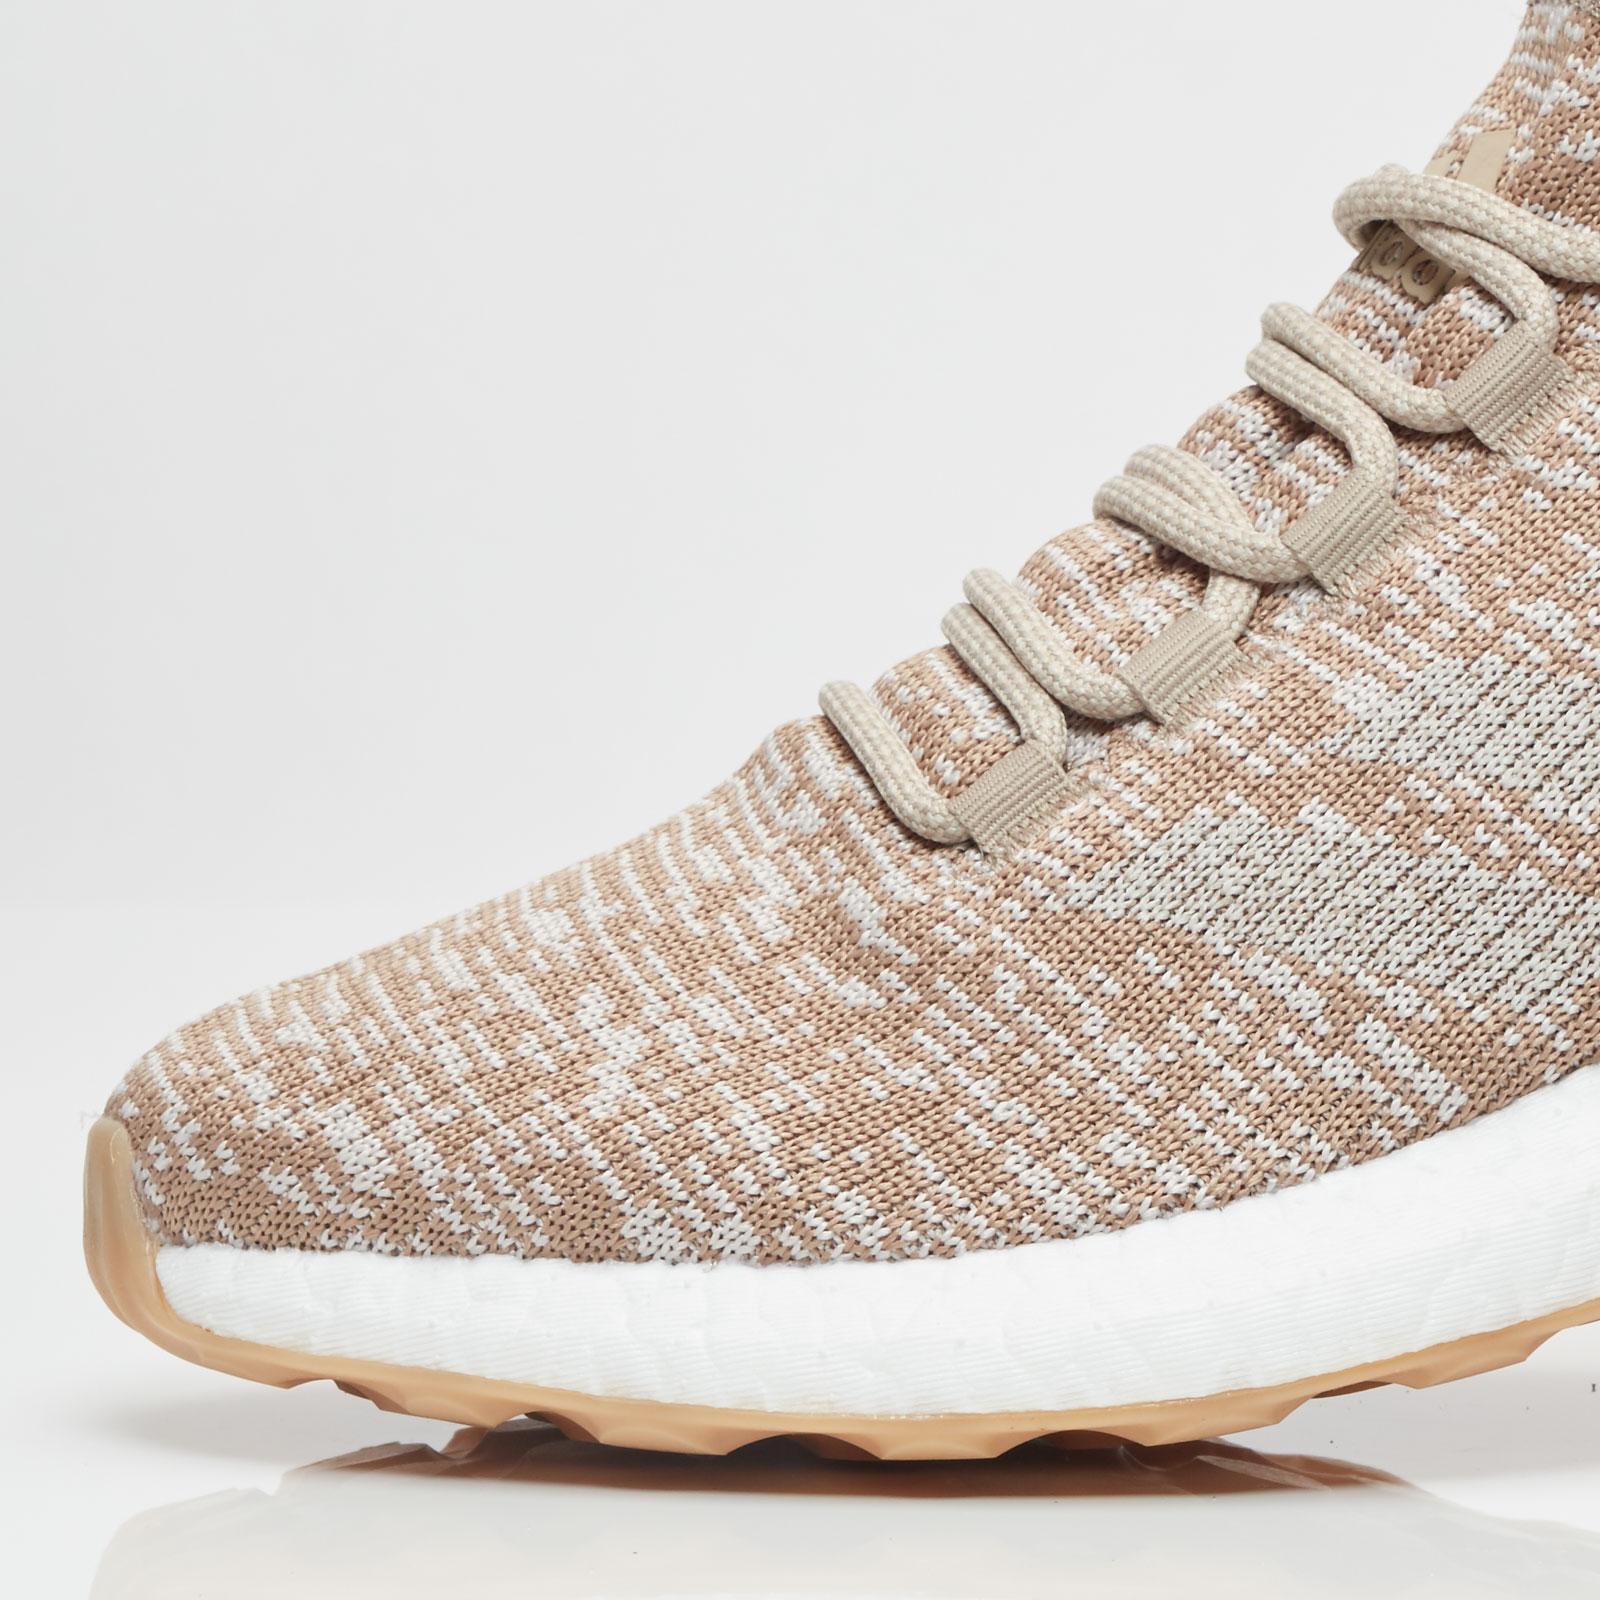 cf36b6788 adidas PureBOOST - S81992 - Sneakersnstuff